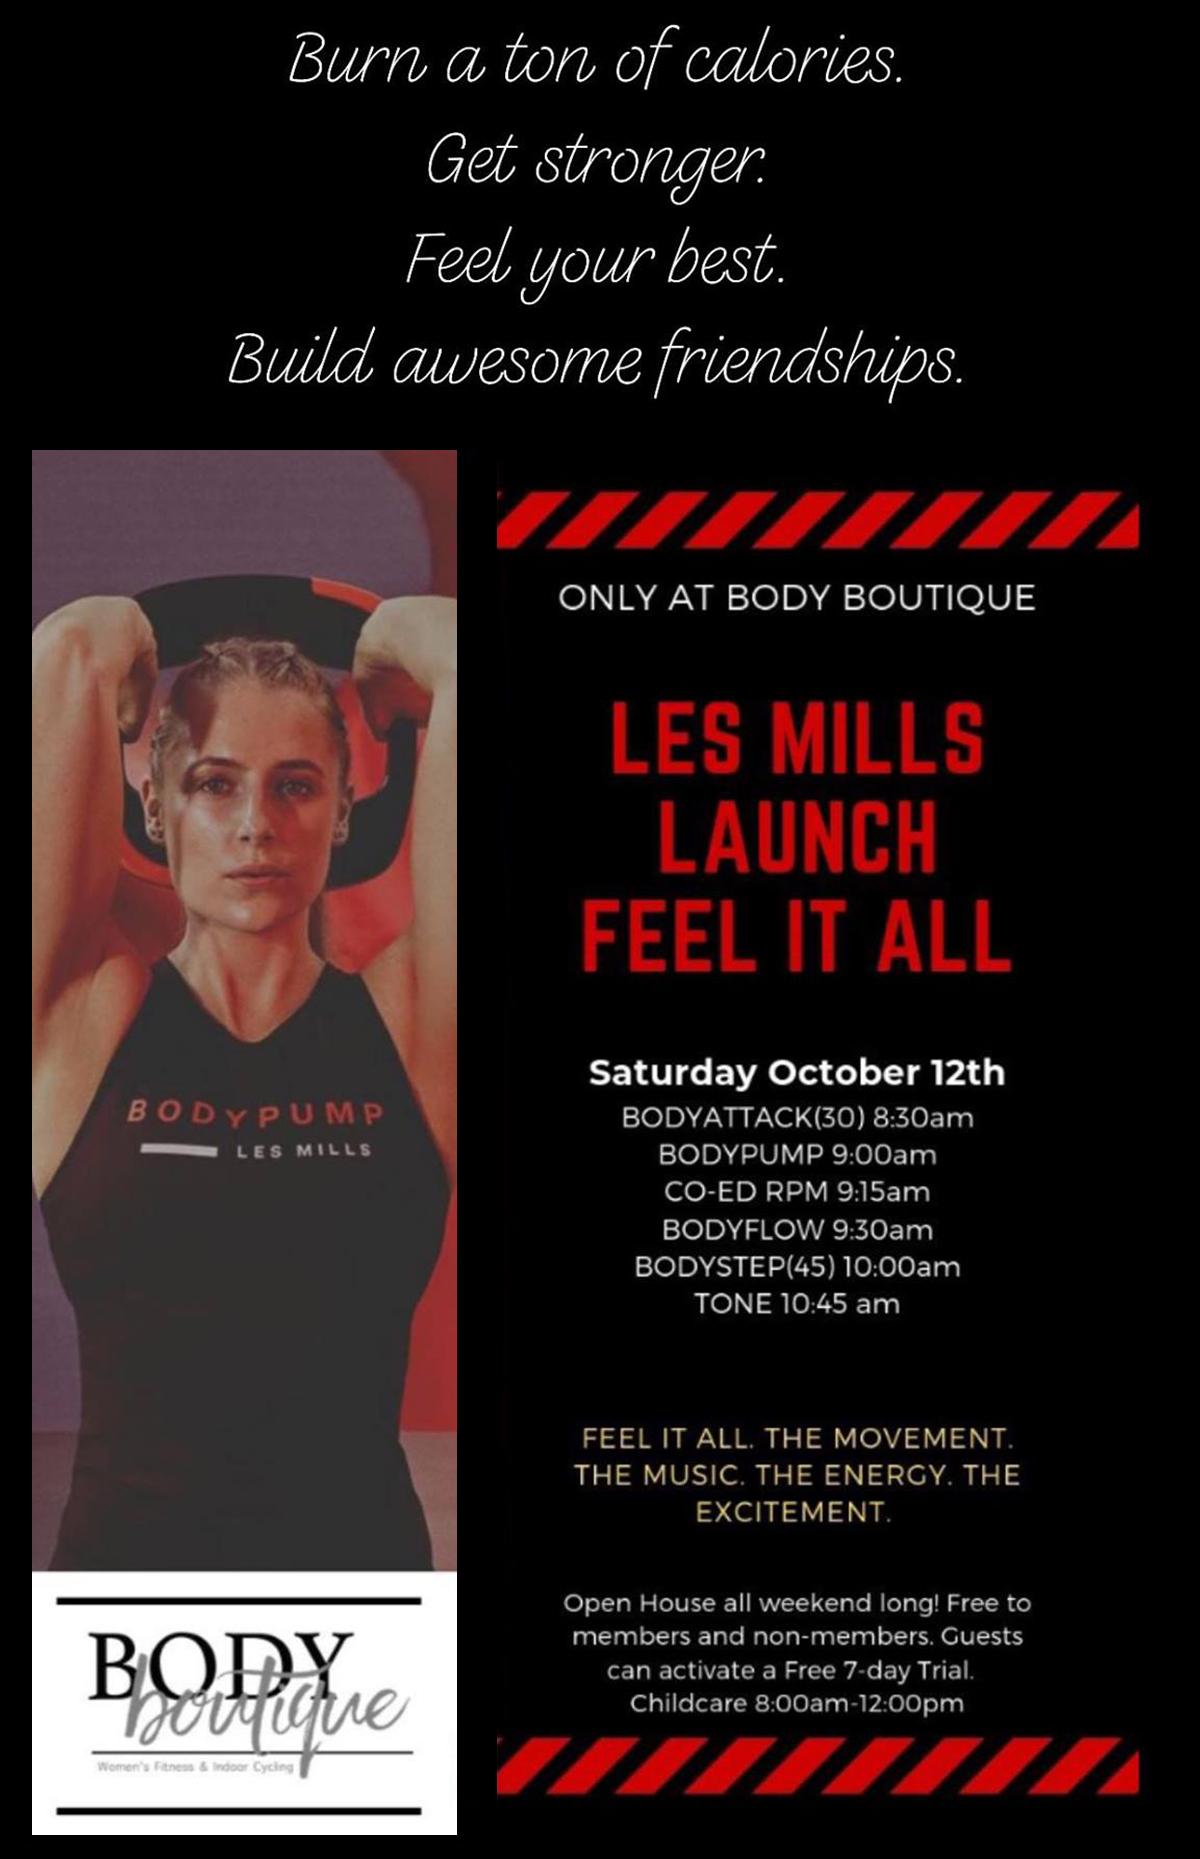 Les Mills Class Launch - October 12th, 2019